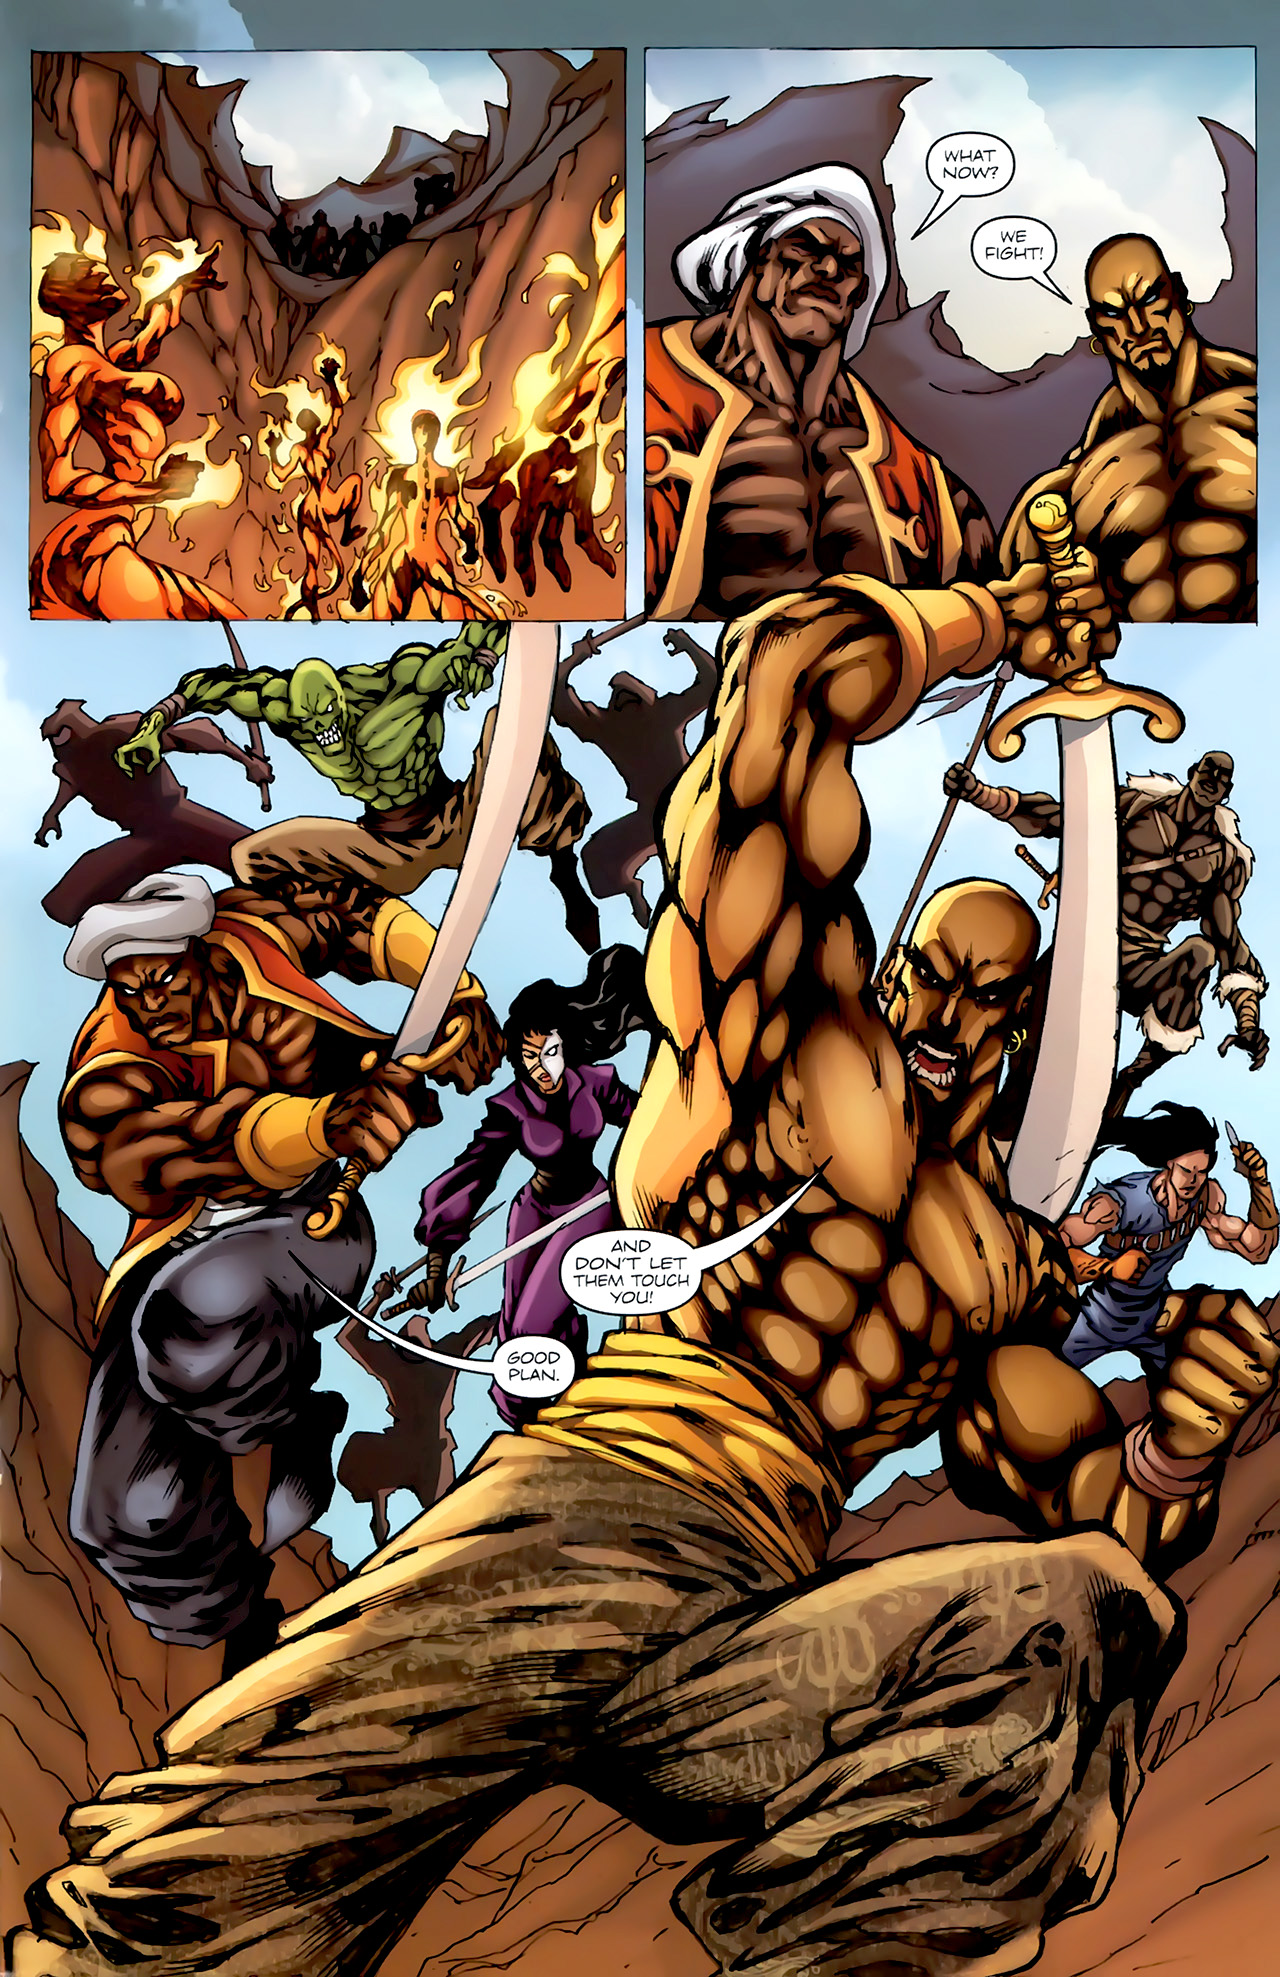 Read online 1001 Arabian Nights: The Adventures of Sinbad comic -  Issue #4 - 15